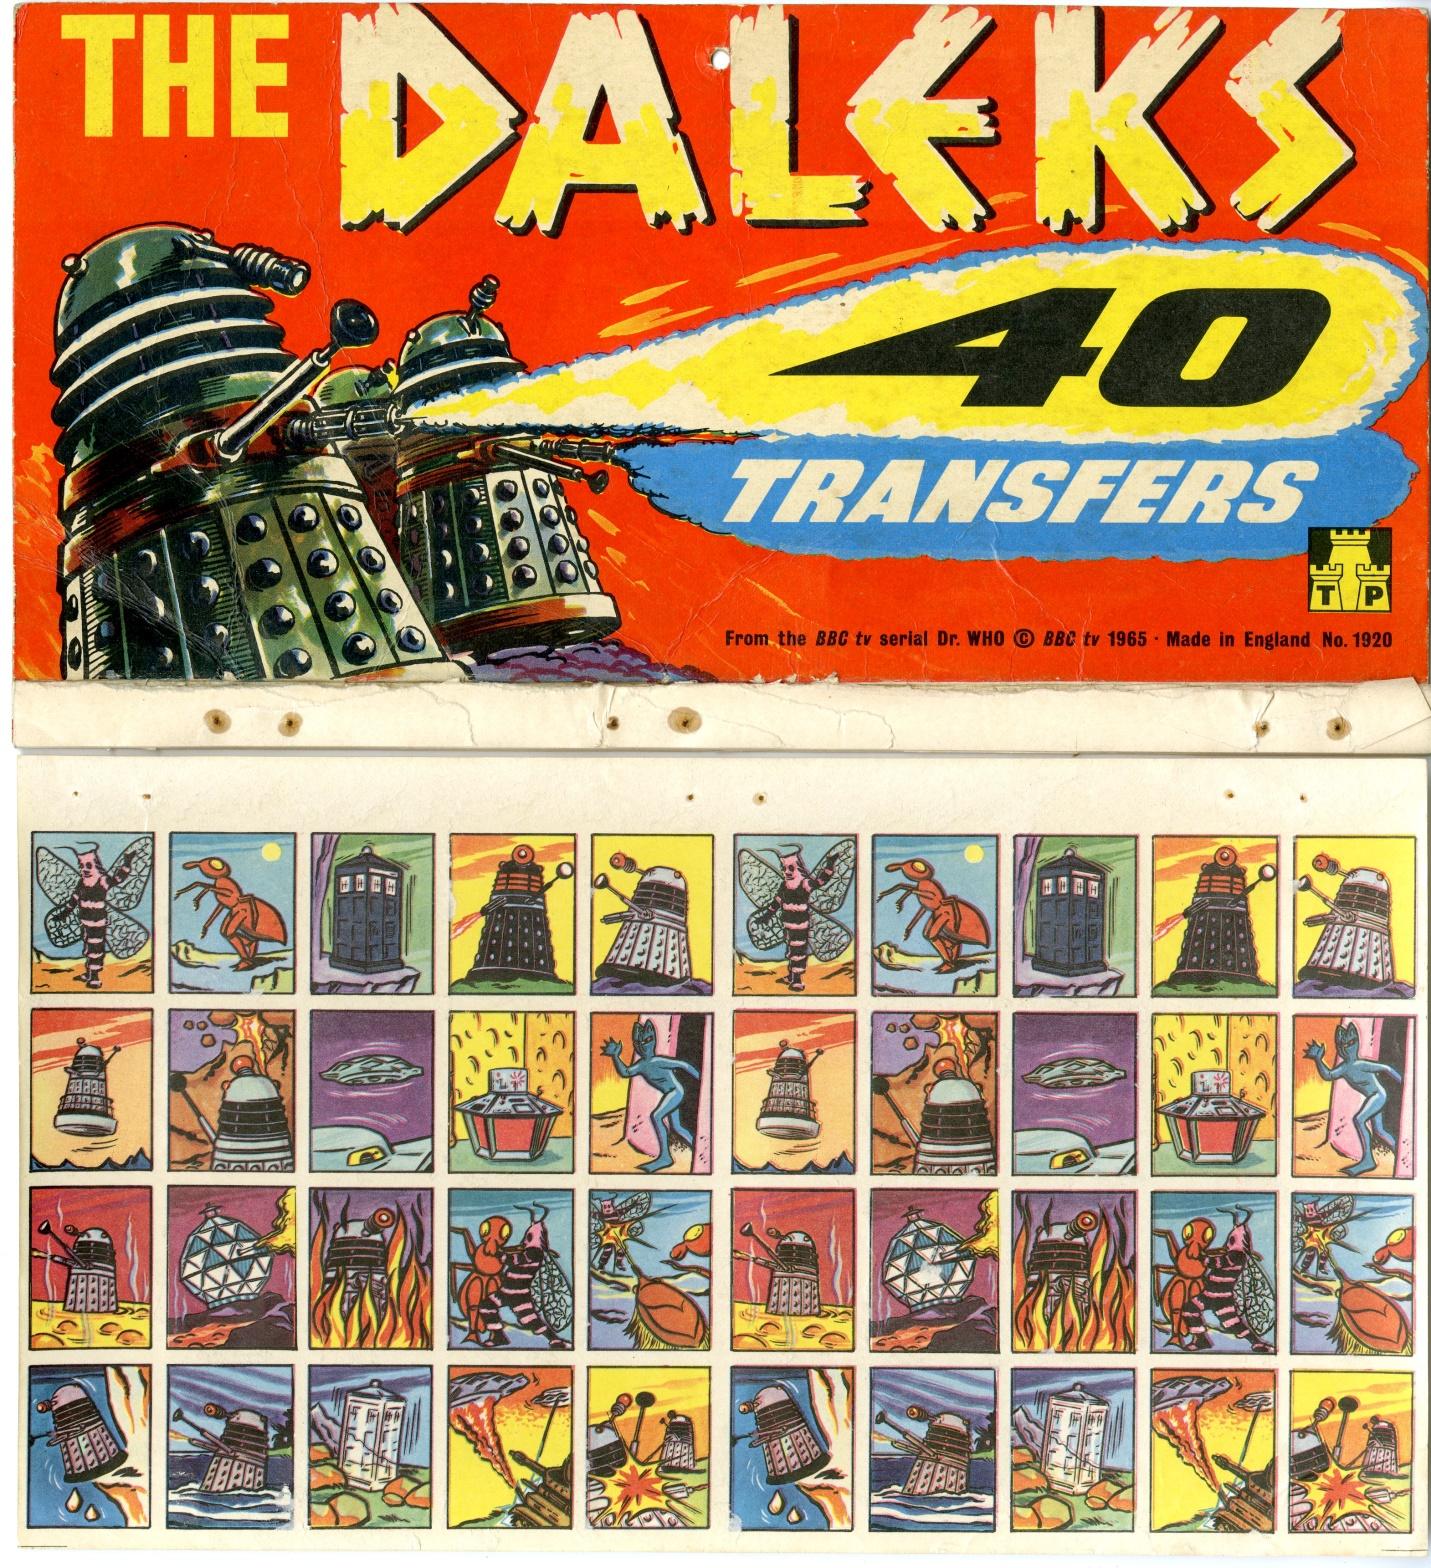 S. Guiterman and Company Ltd., Tower Press, Dalek Transfers on shop display card